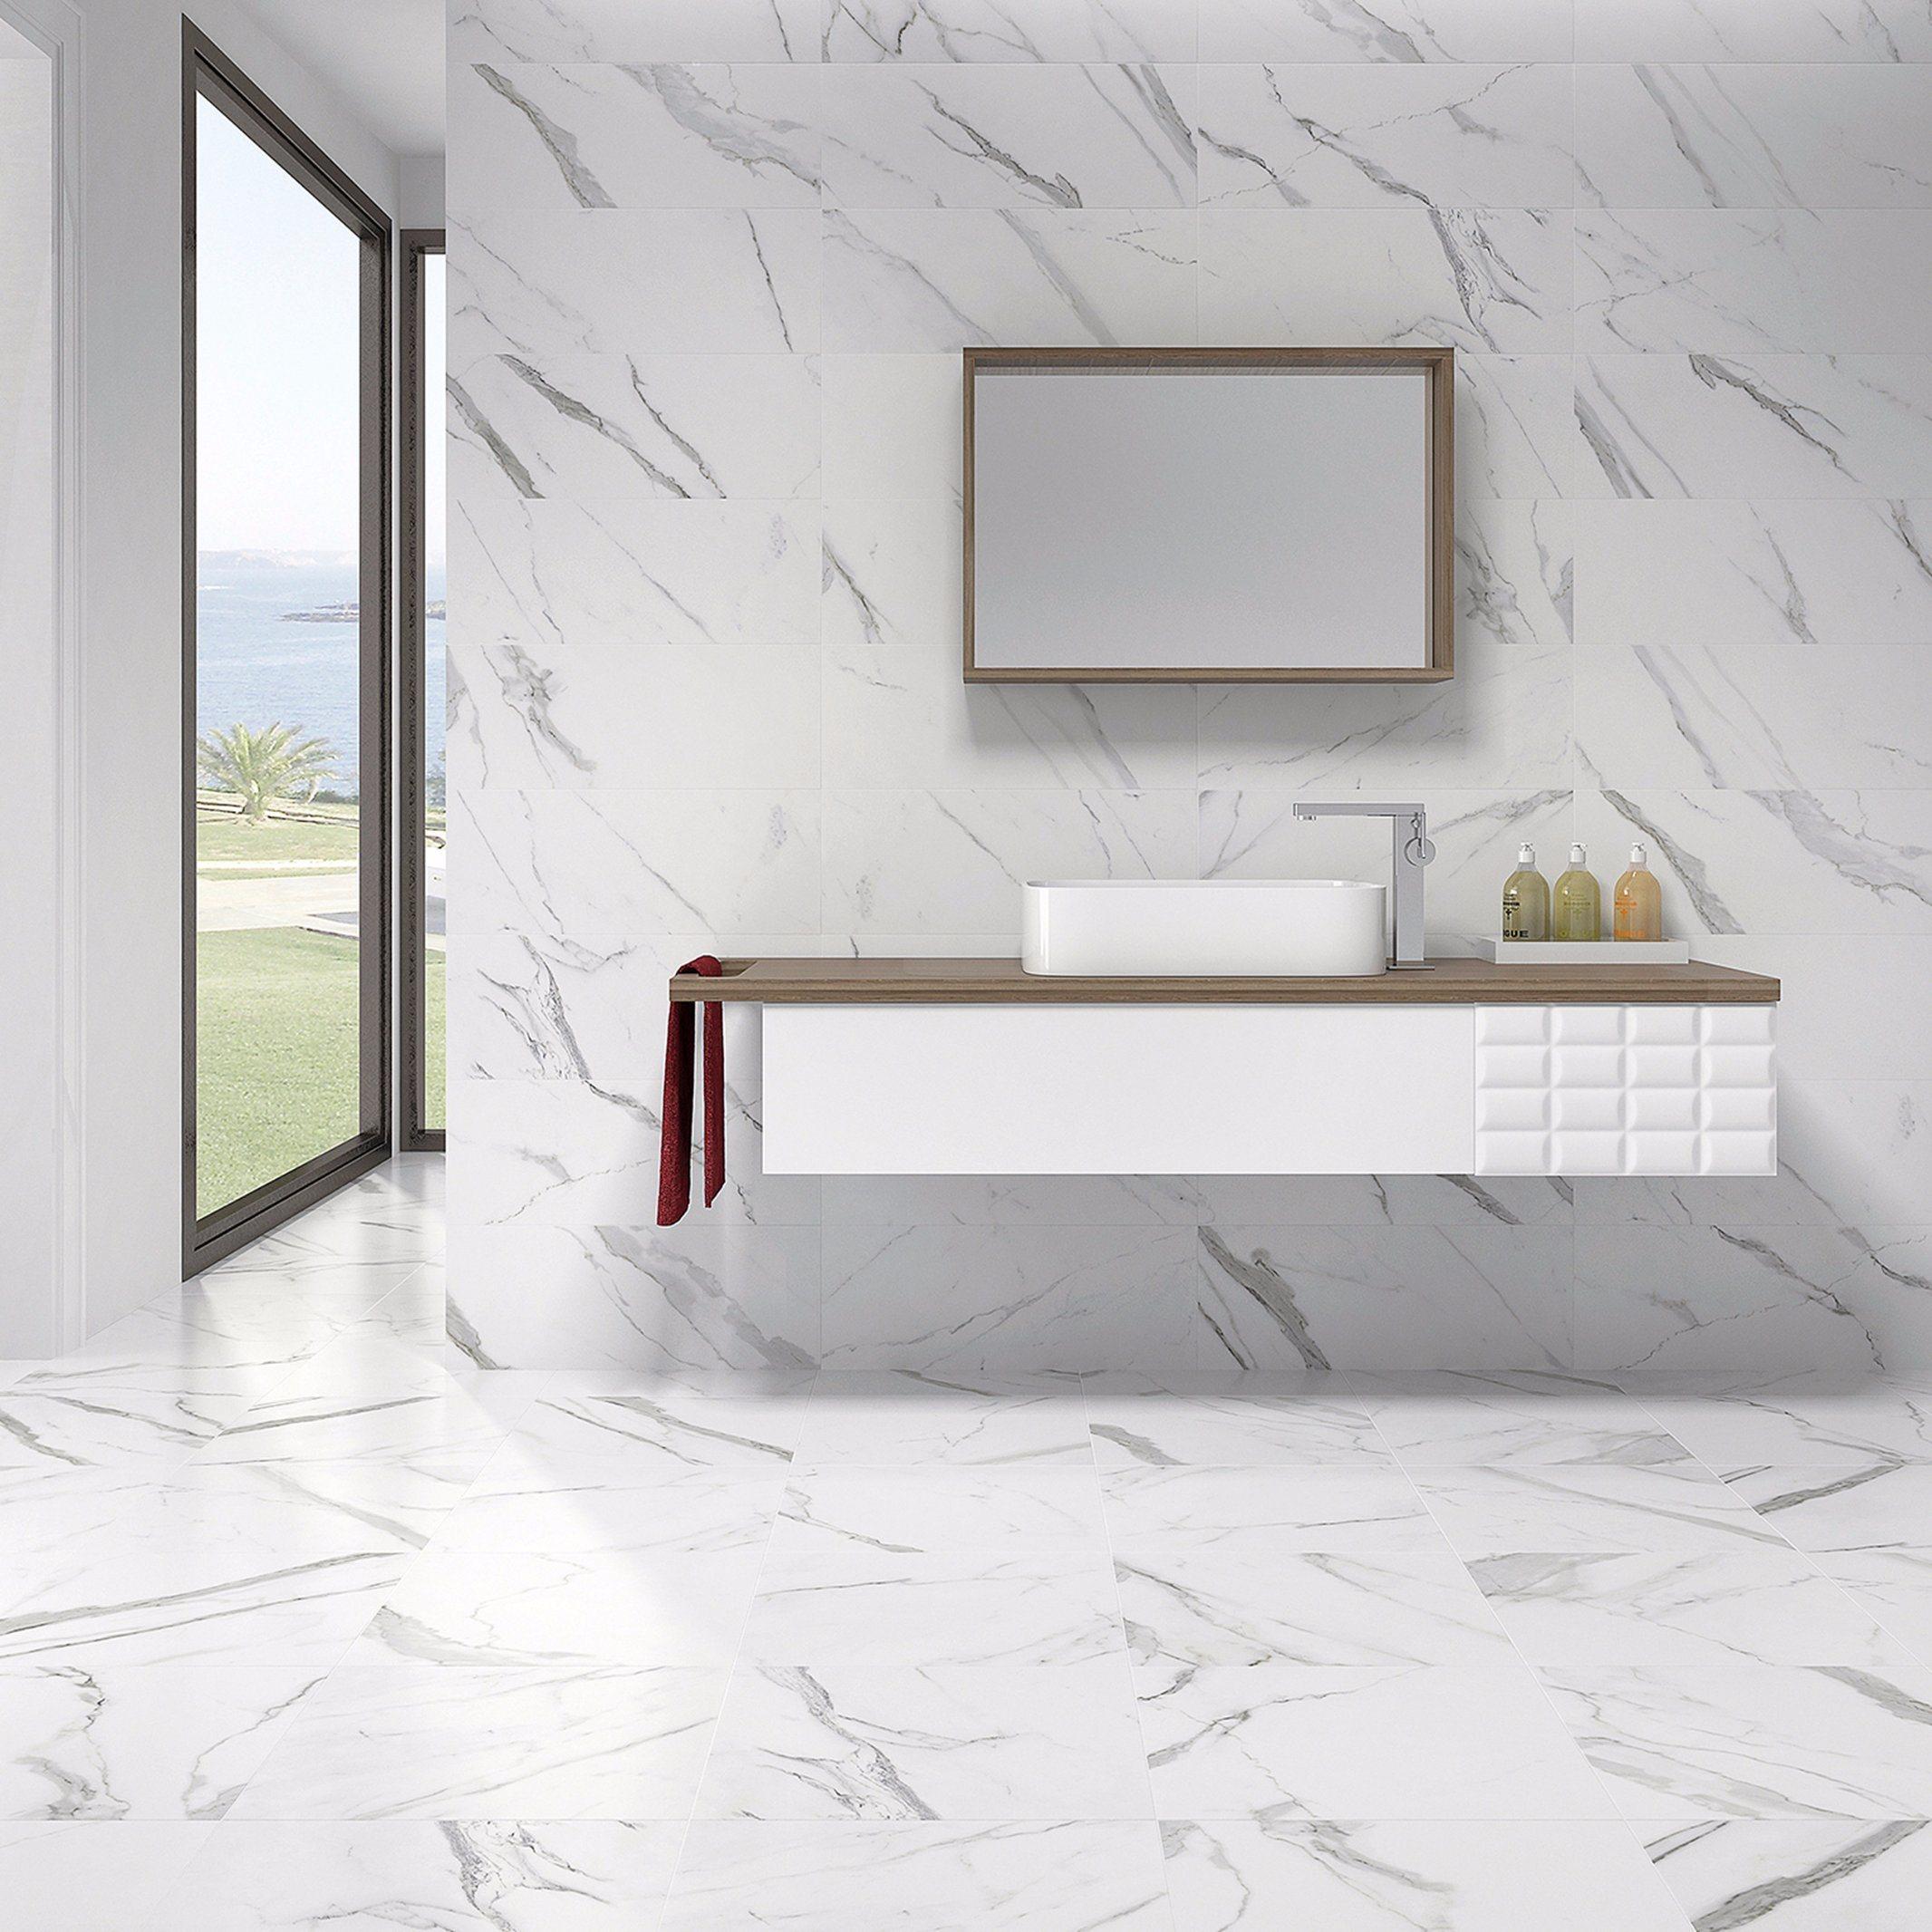 China Building Material Glazed Interior Ceramic Bathroom Wall Tile ...